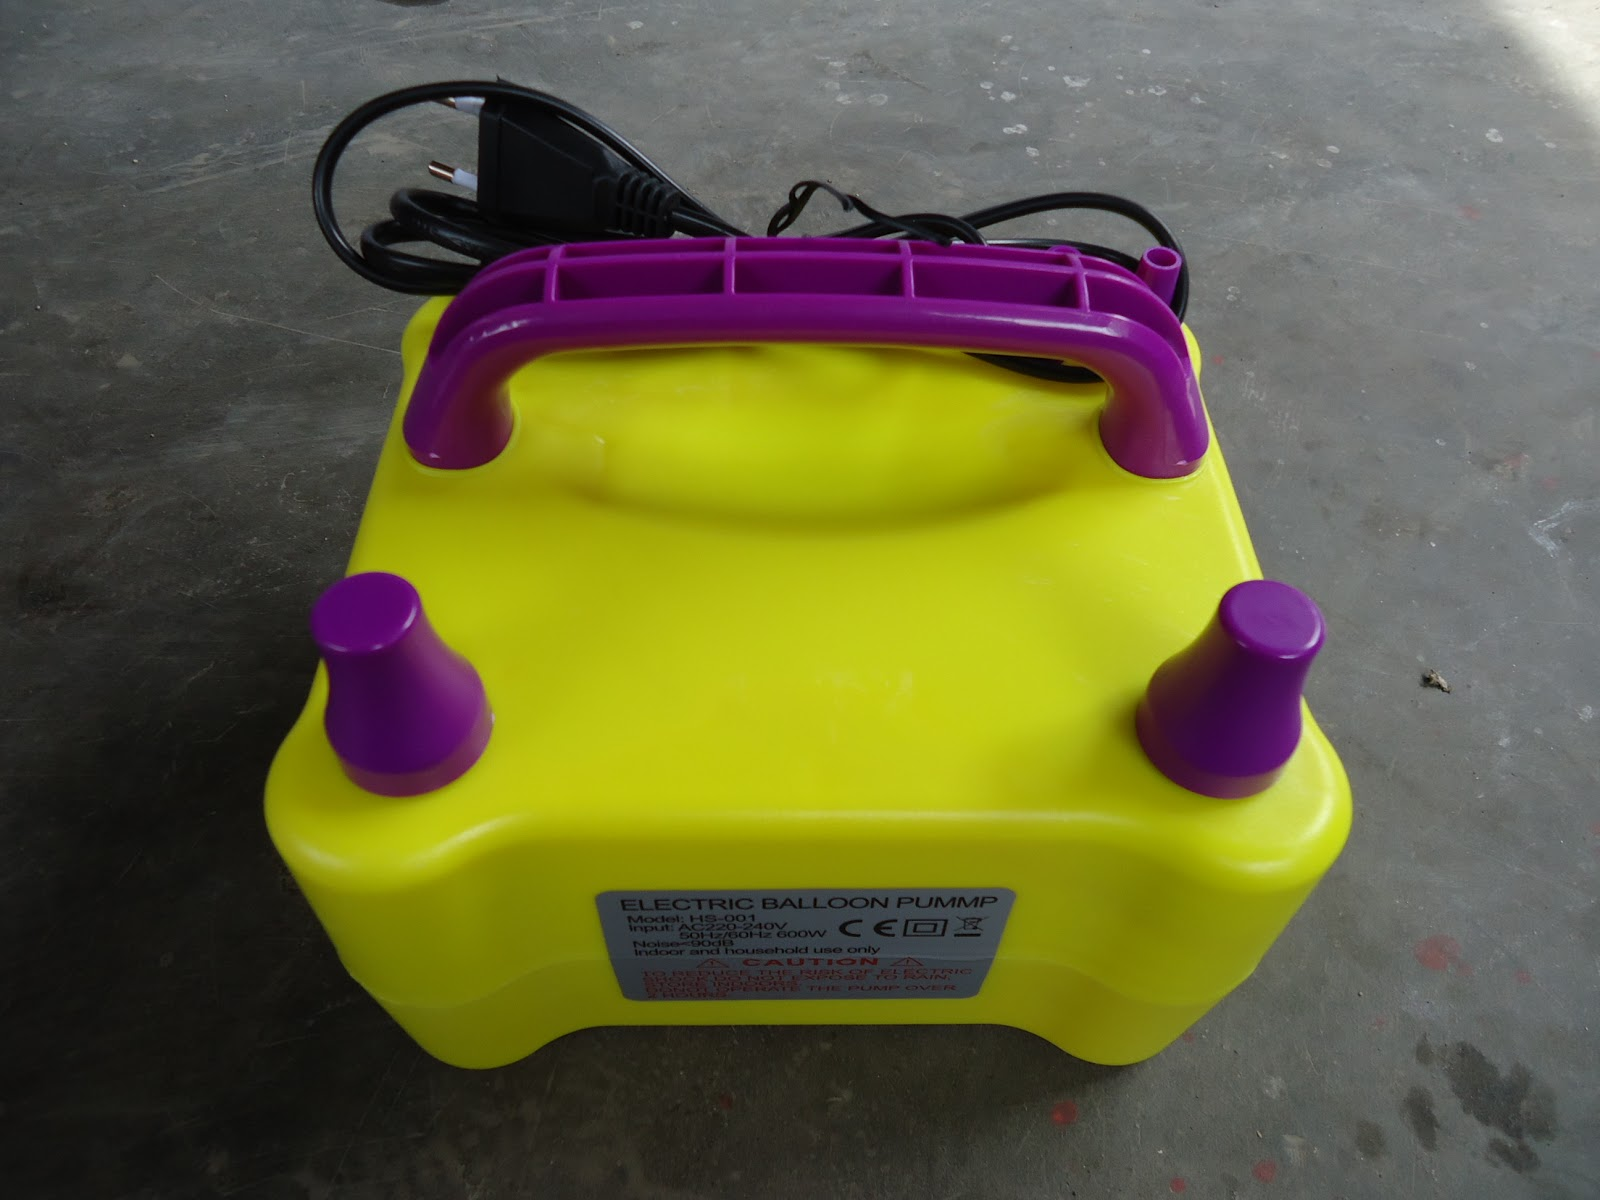 Pompa Balon Manual Elektrik Aneka Telp 021 29680094 Hp Listrik Electric Balloon Pump Dengan Kecepatan 1500pcs Jam Sangat Membantu Usaha Dekorasi Anda Cukup Menekan Tombol Katup Udara Secara Otomatis Angin Keluar